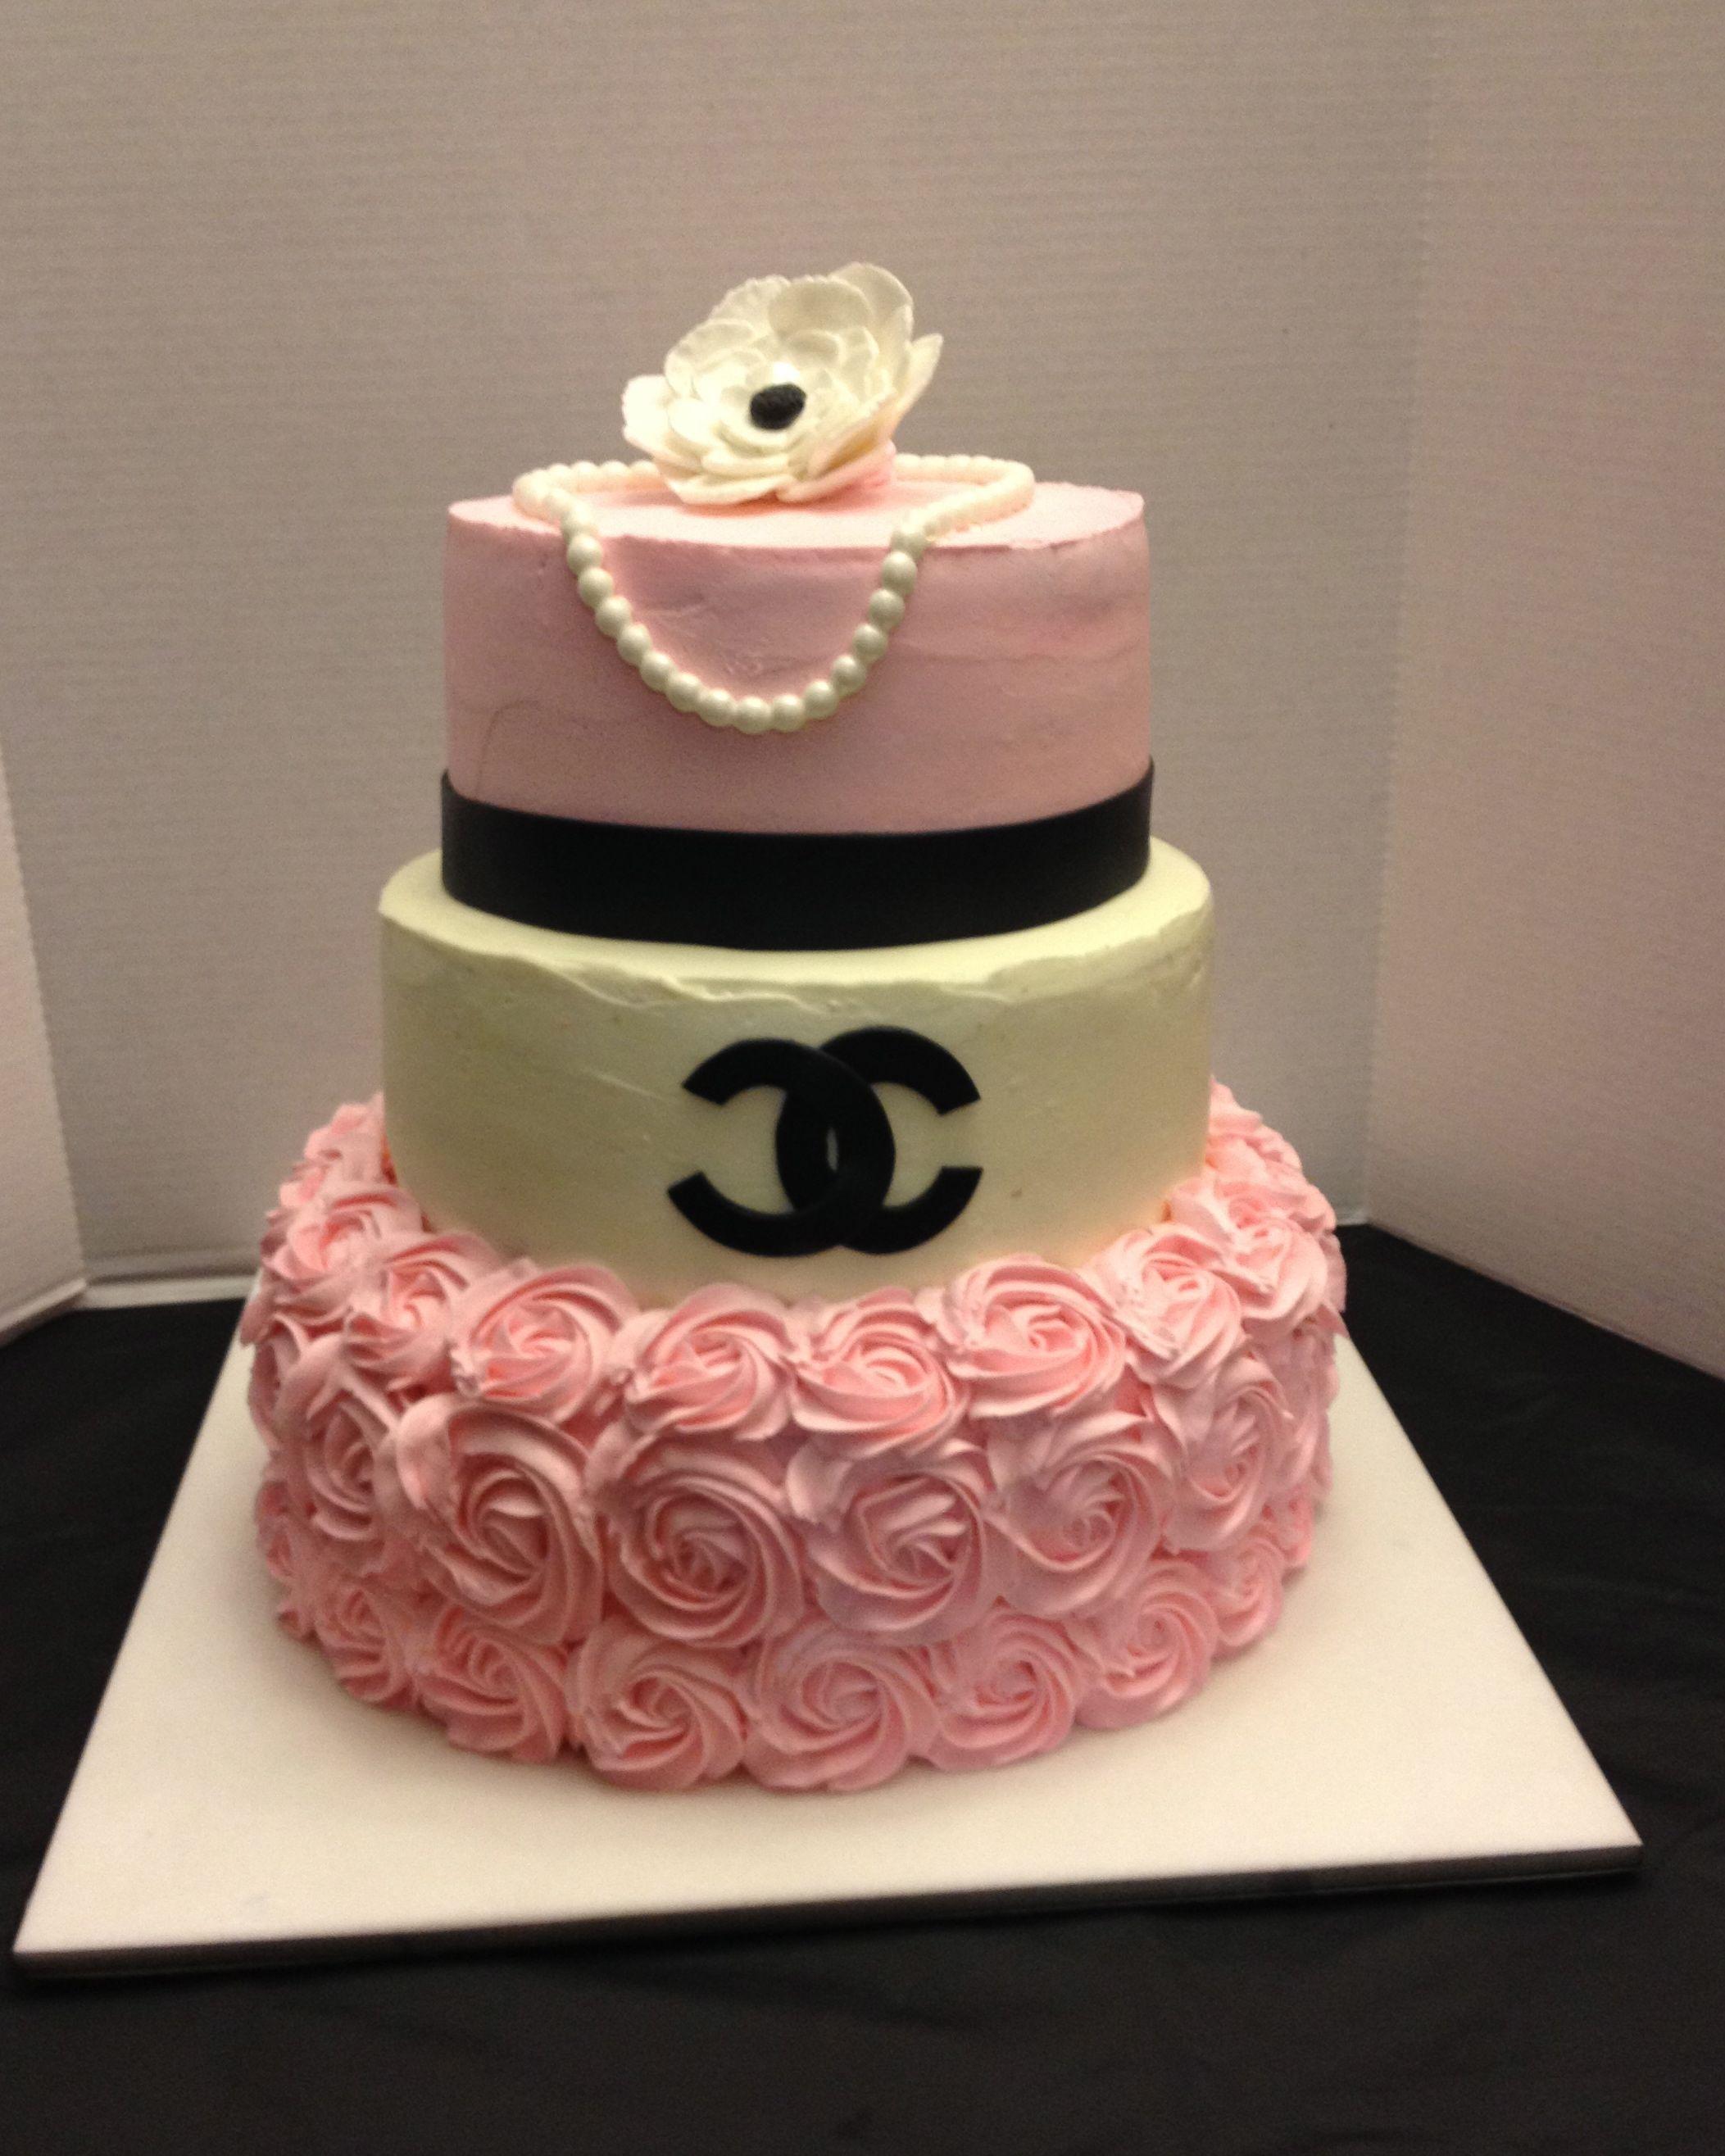 Chanel Cake Designs: Coco Chanel Party